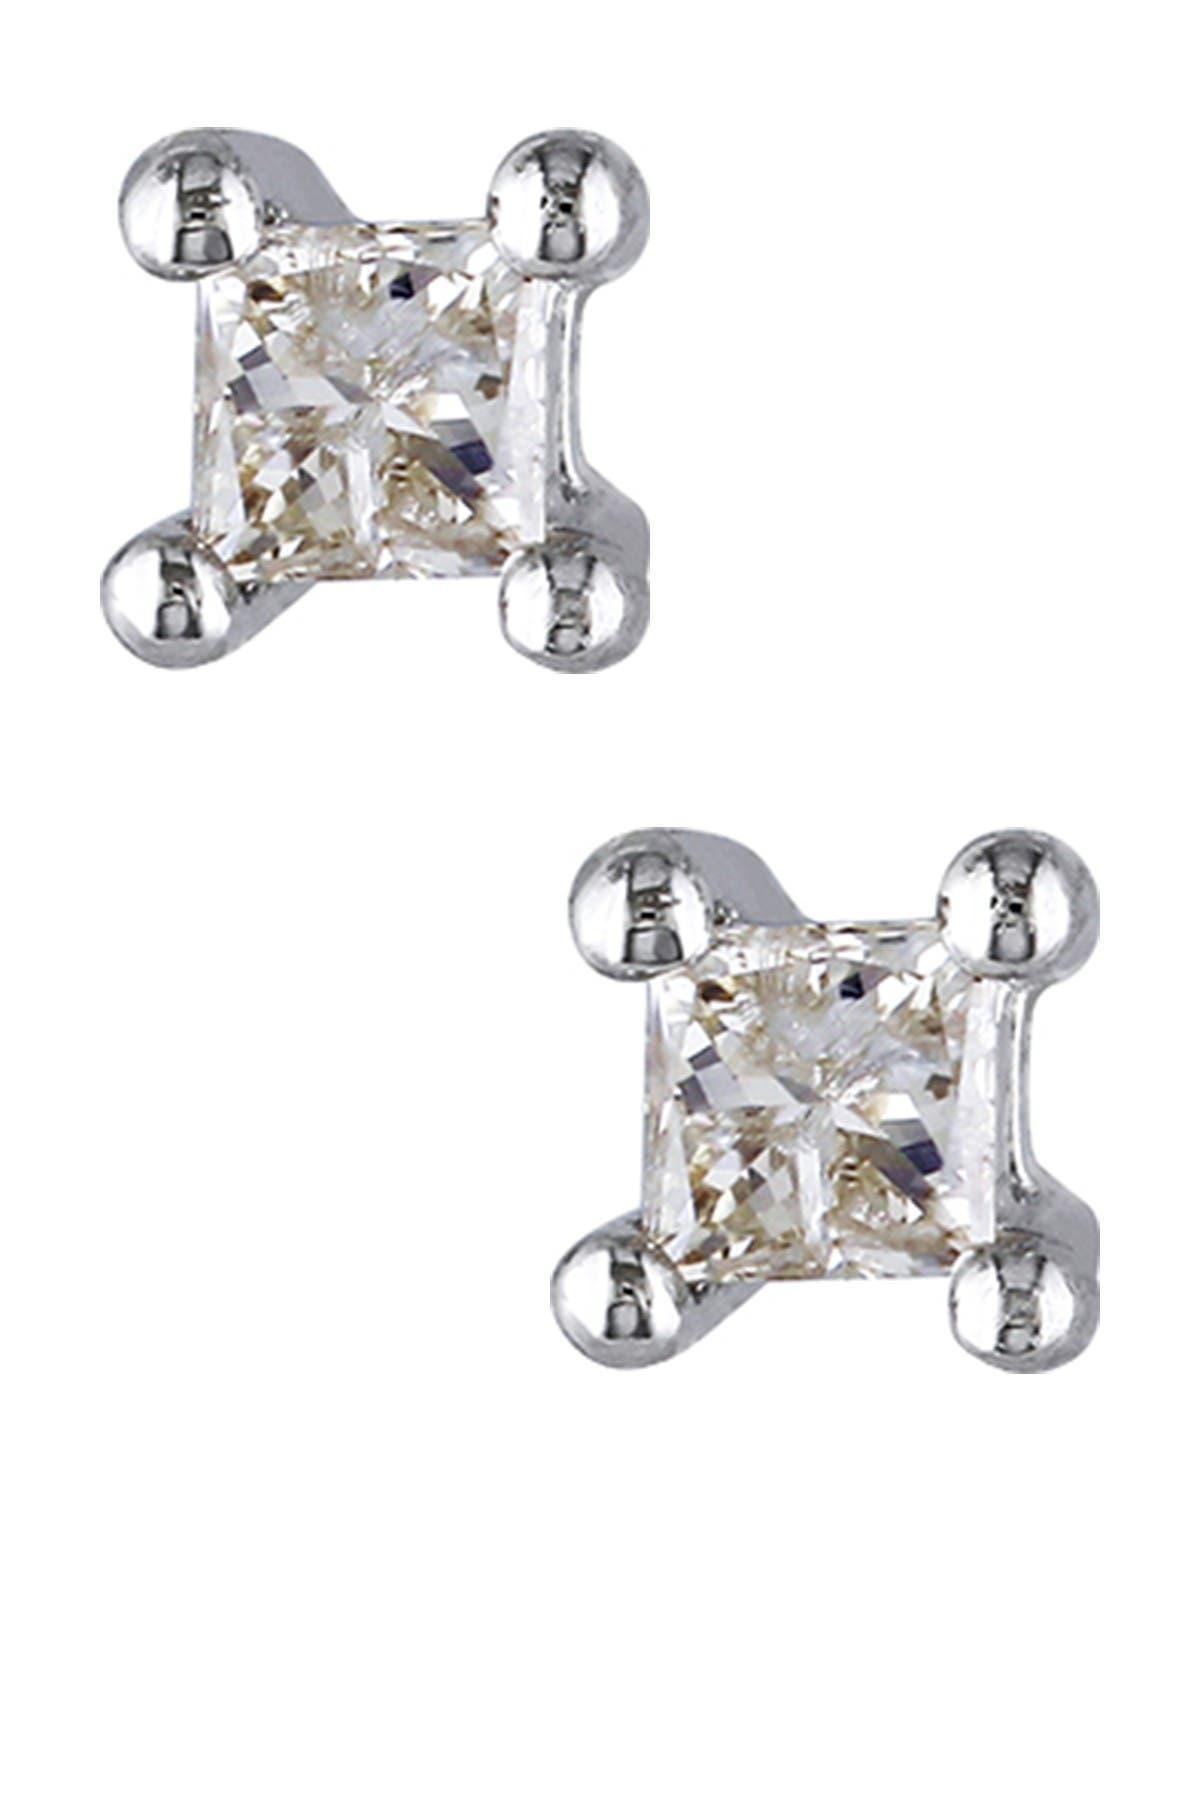 Image of Delmar Sterling Silver Princess Cut Diamond Stud Earrings - 0.10 ctw